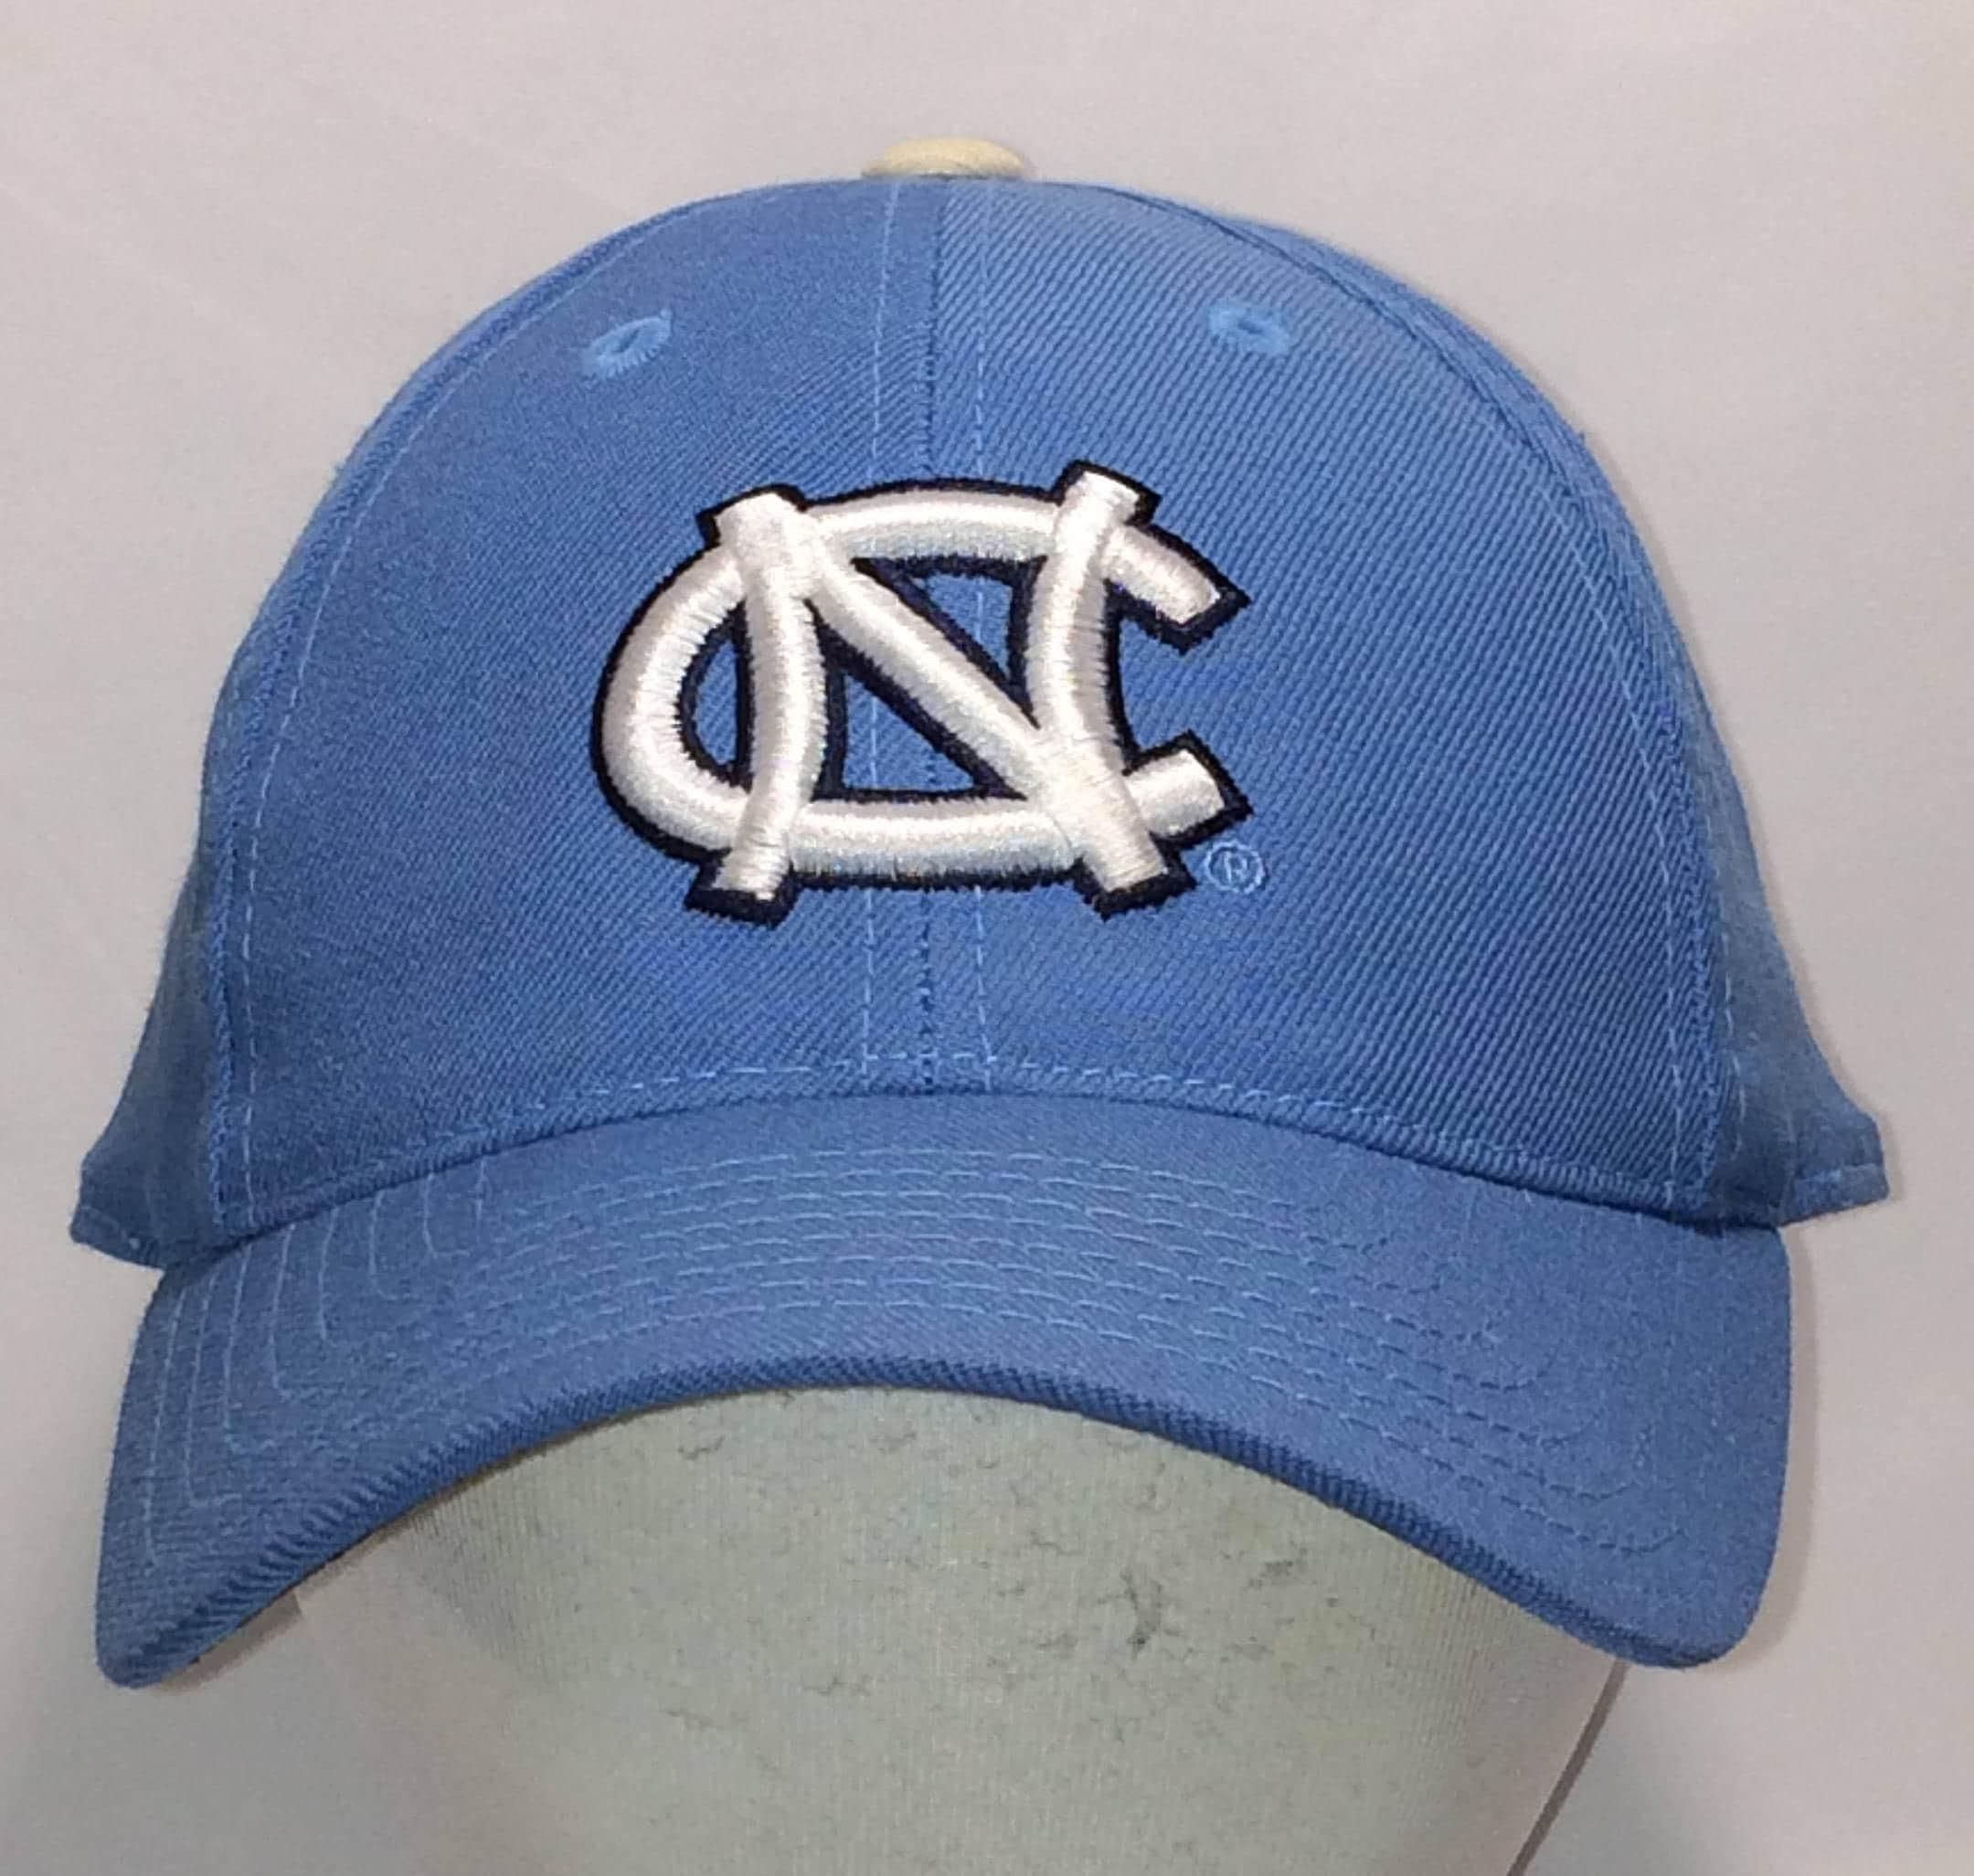 Vintage UNC Tar Heels Baseball Cap Hat NCAA Basketball  cbd4110a738